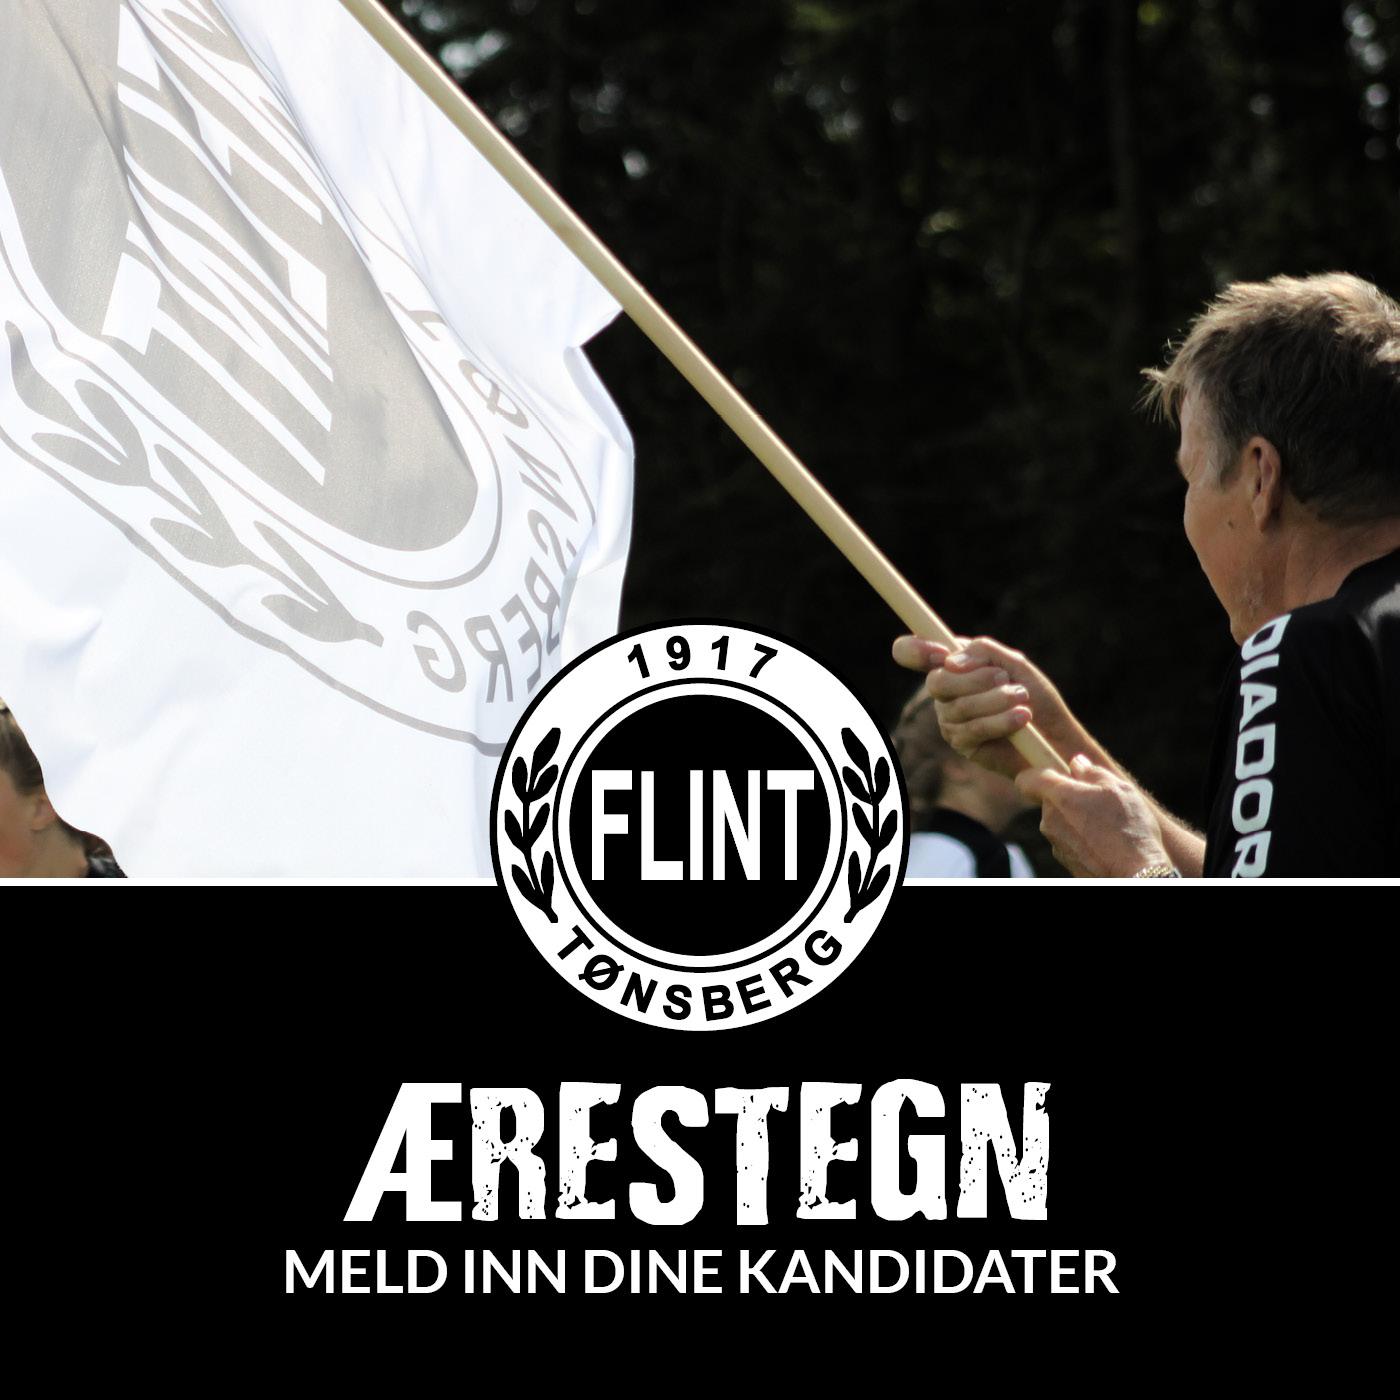 https://www.flintfotball.no/wp-content/uploads/2021/01/AErestegn-meld-kandidater.jpg